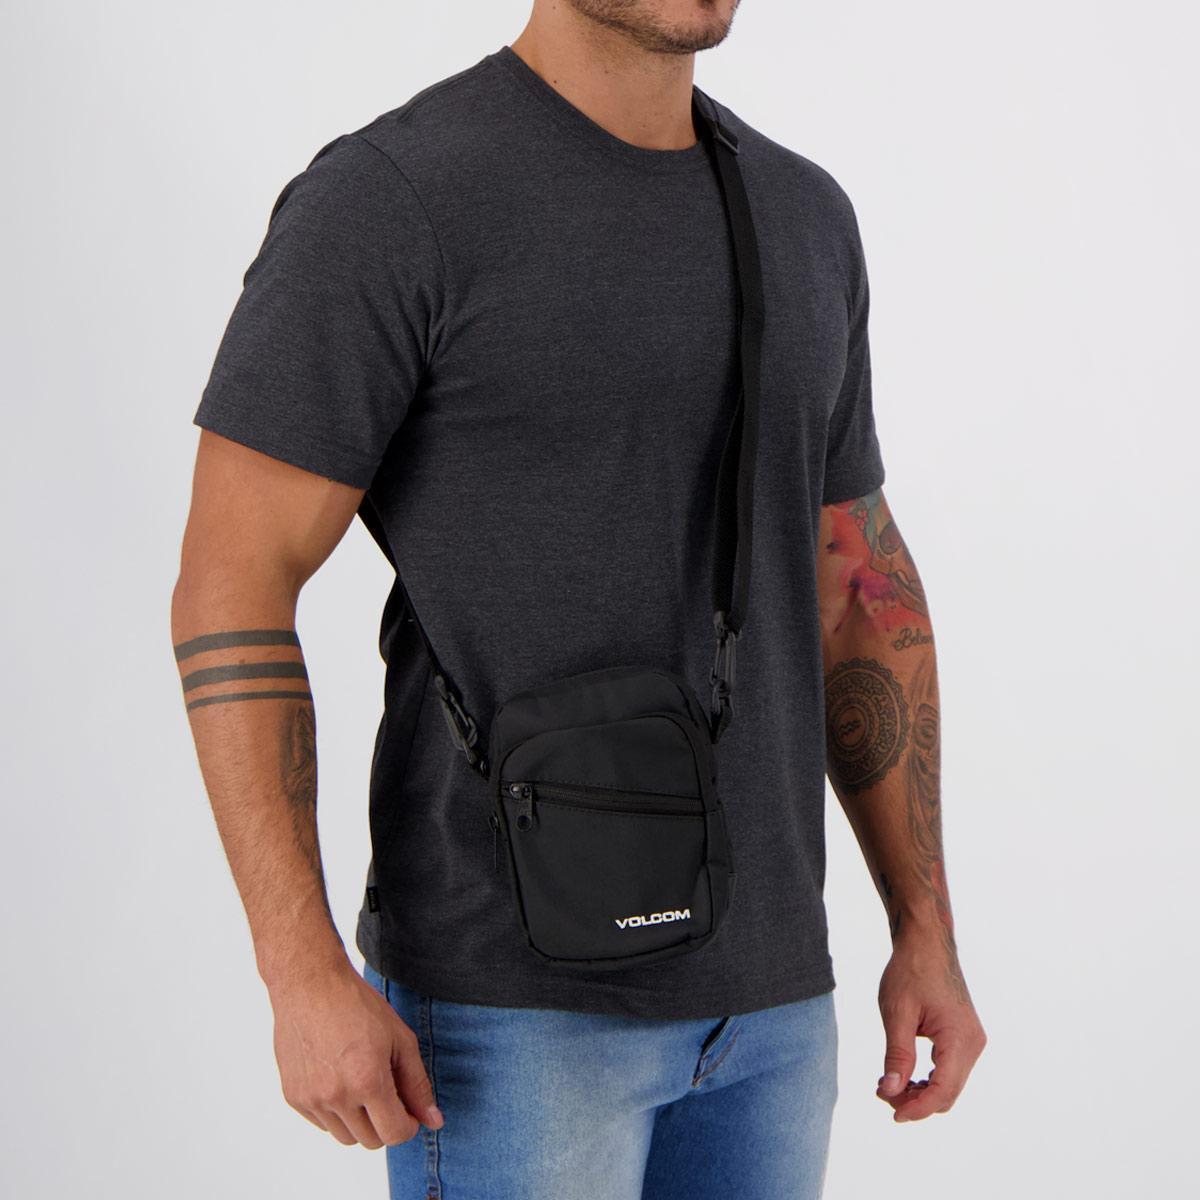 Shoulder Bag Volcom Corporate Masculina